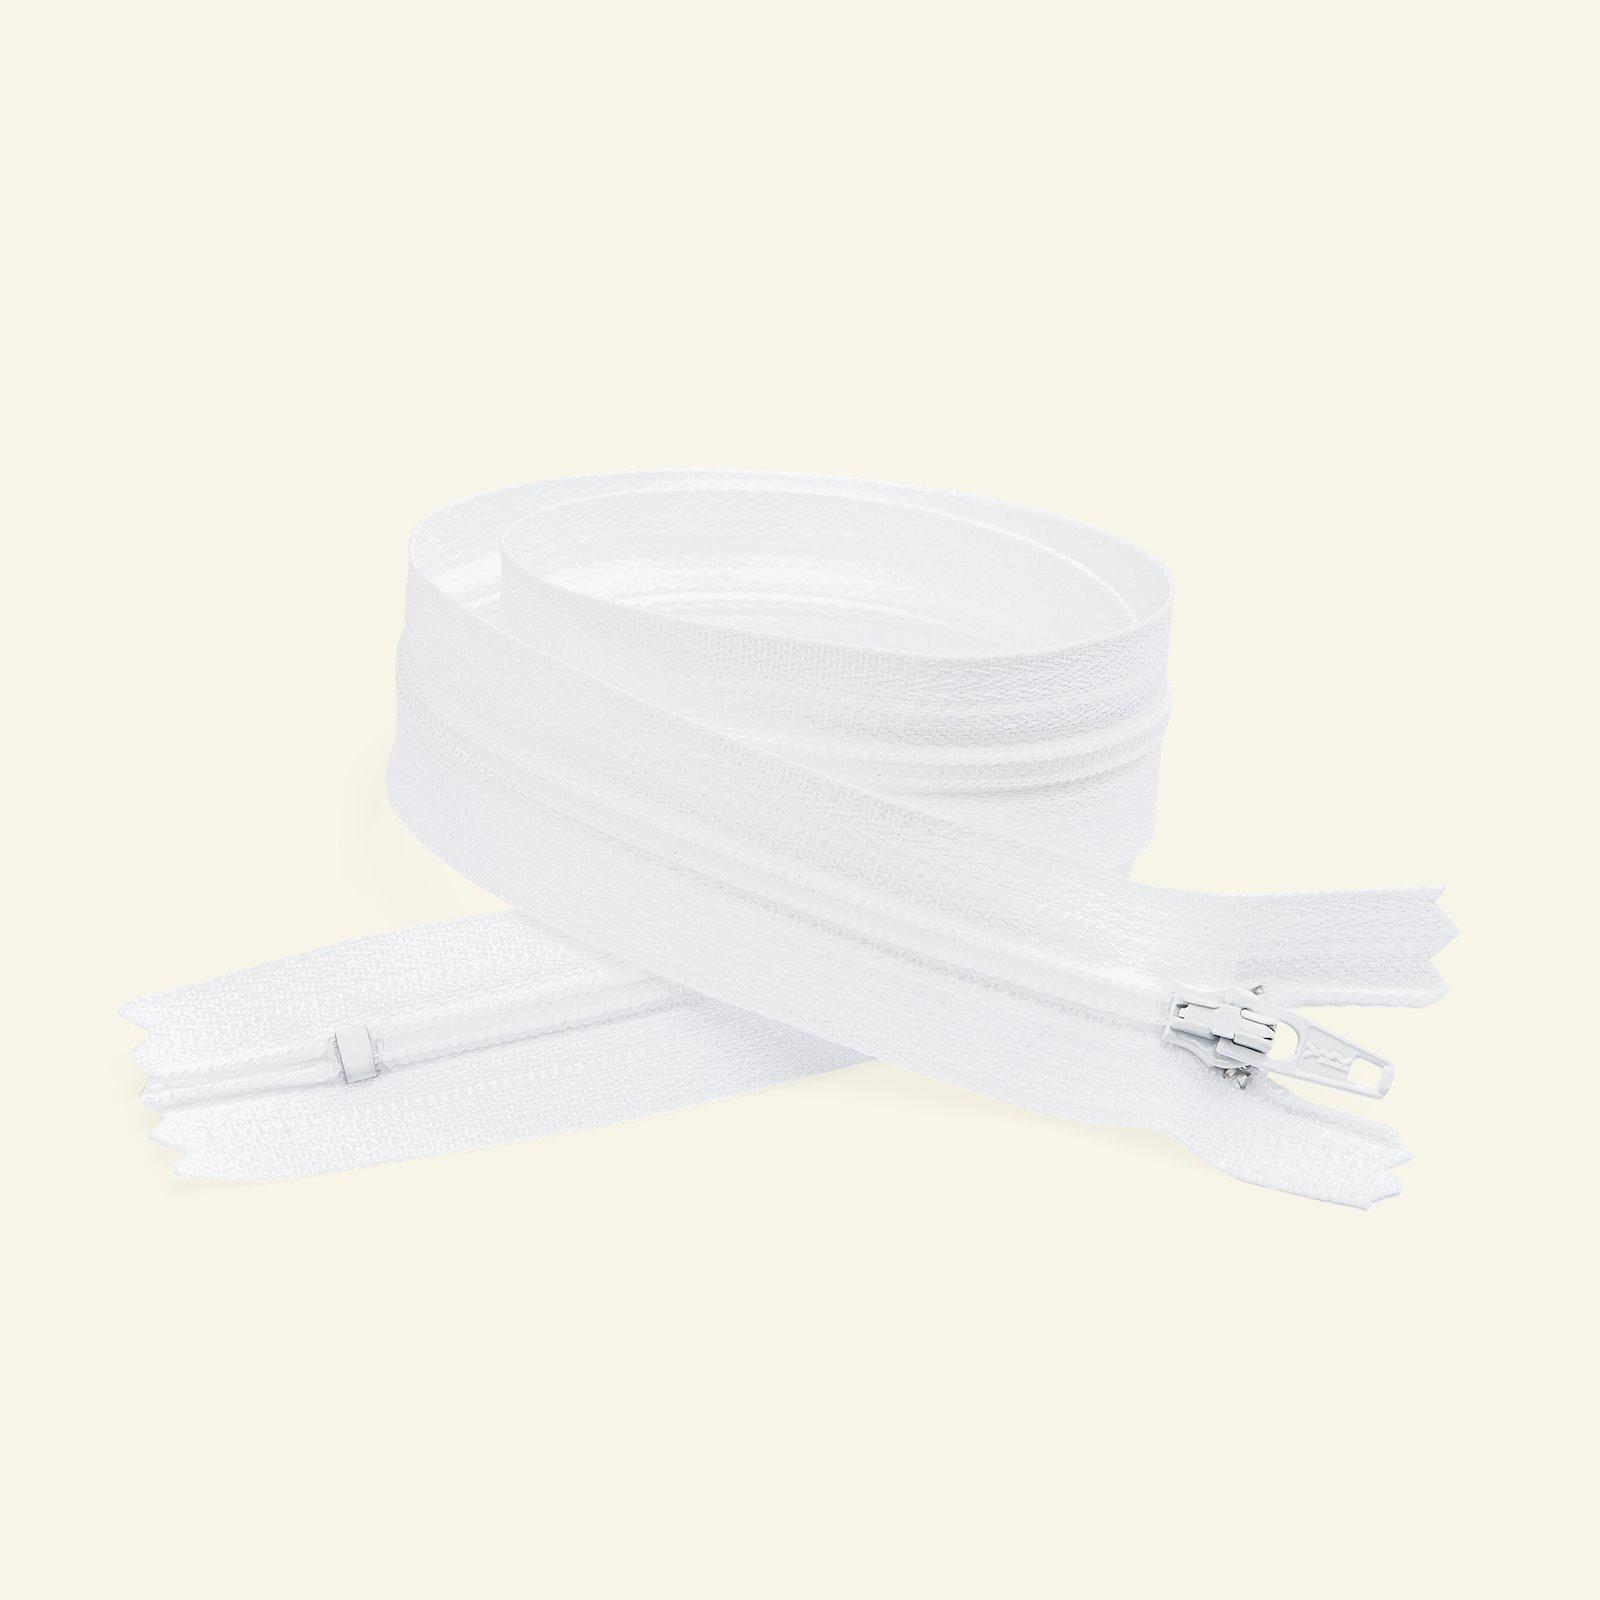 YKK zip 4mm closed end 18cm white x40501_pack